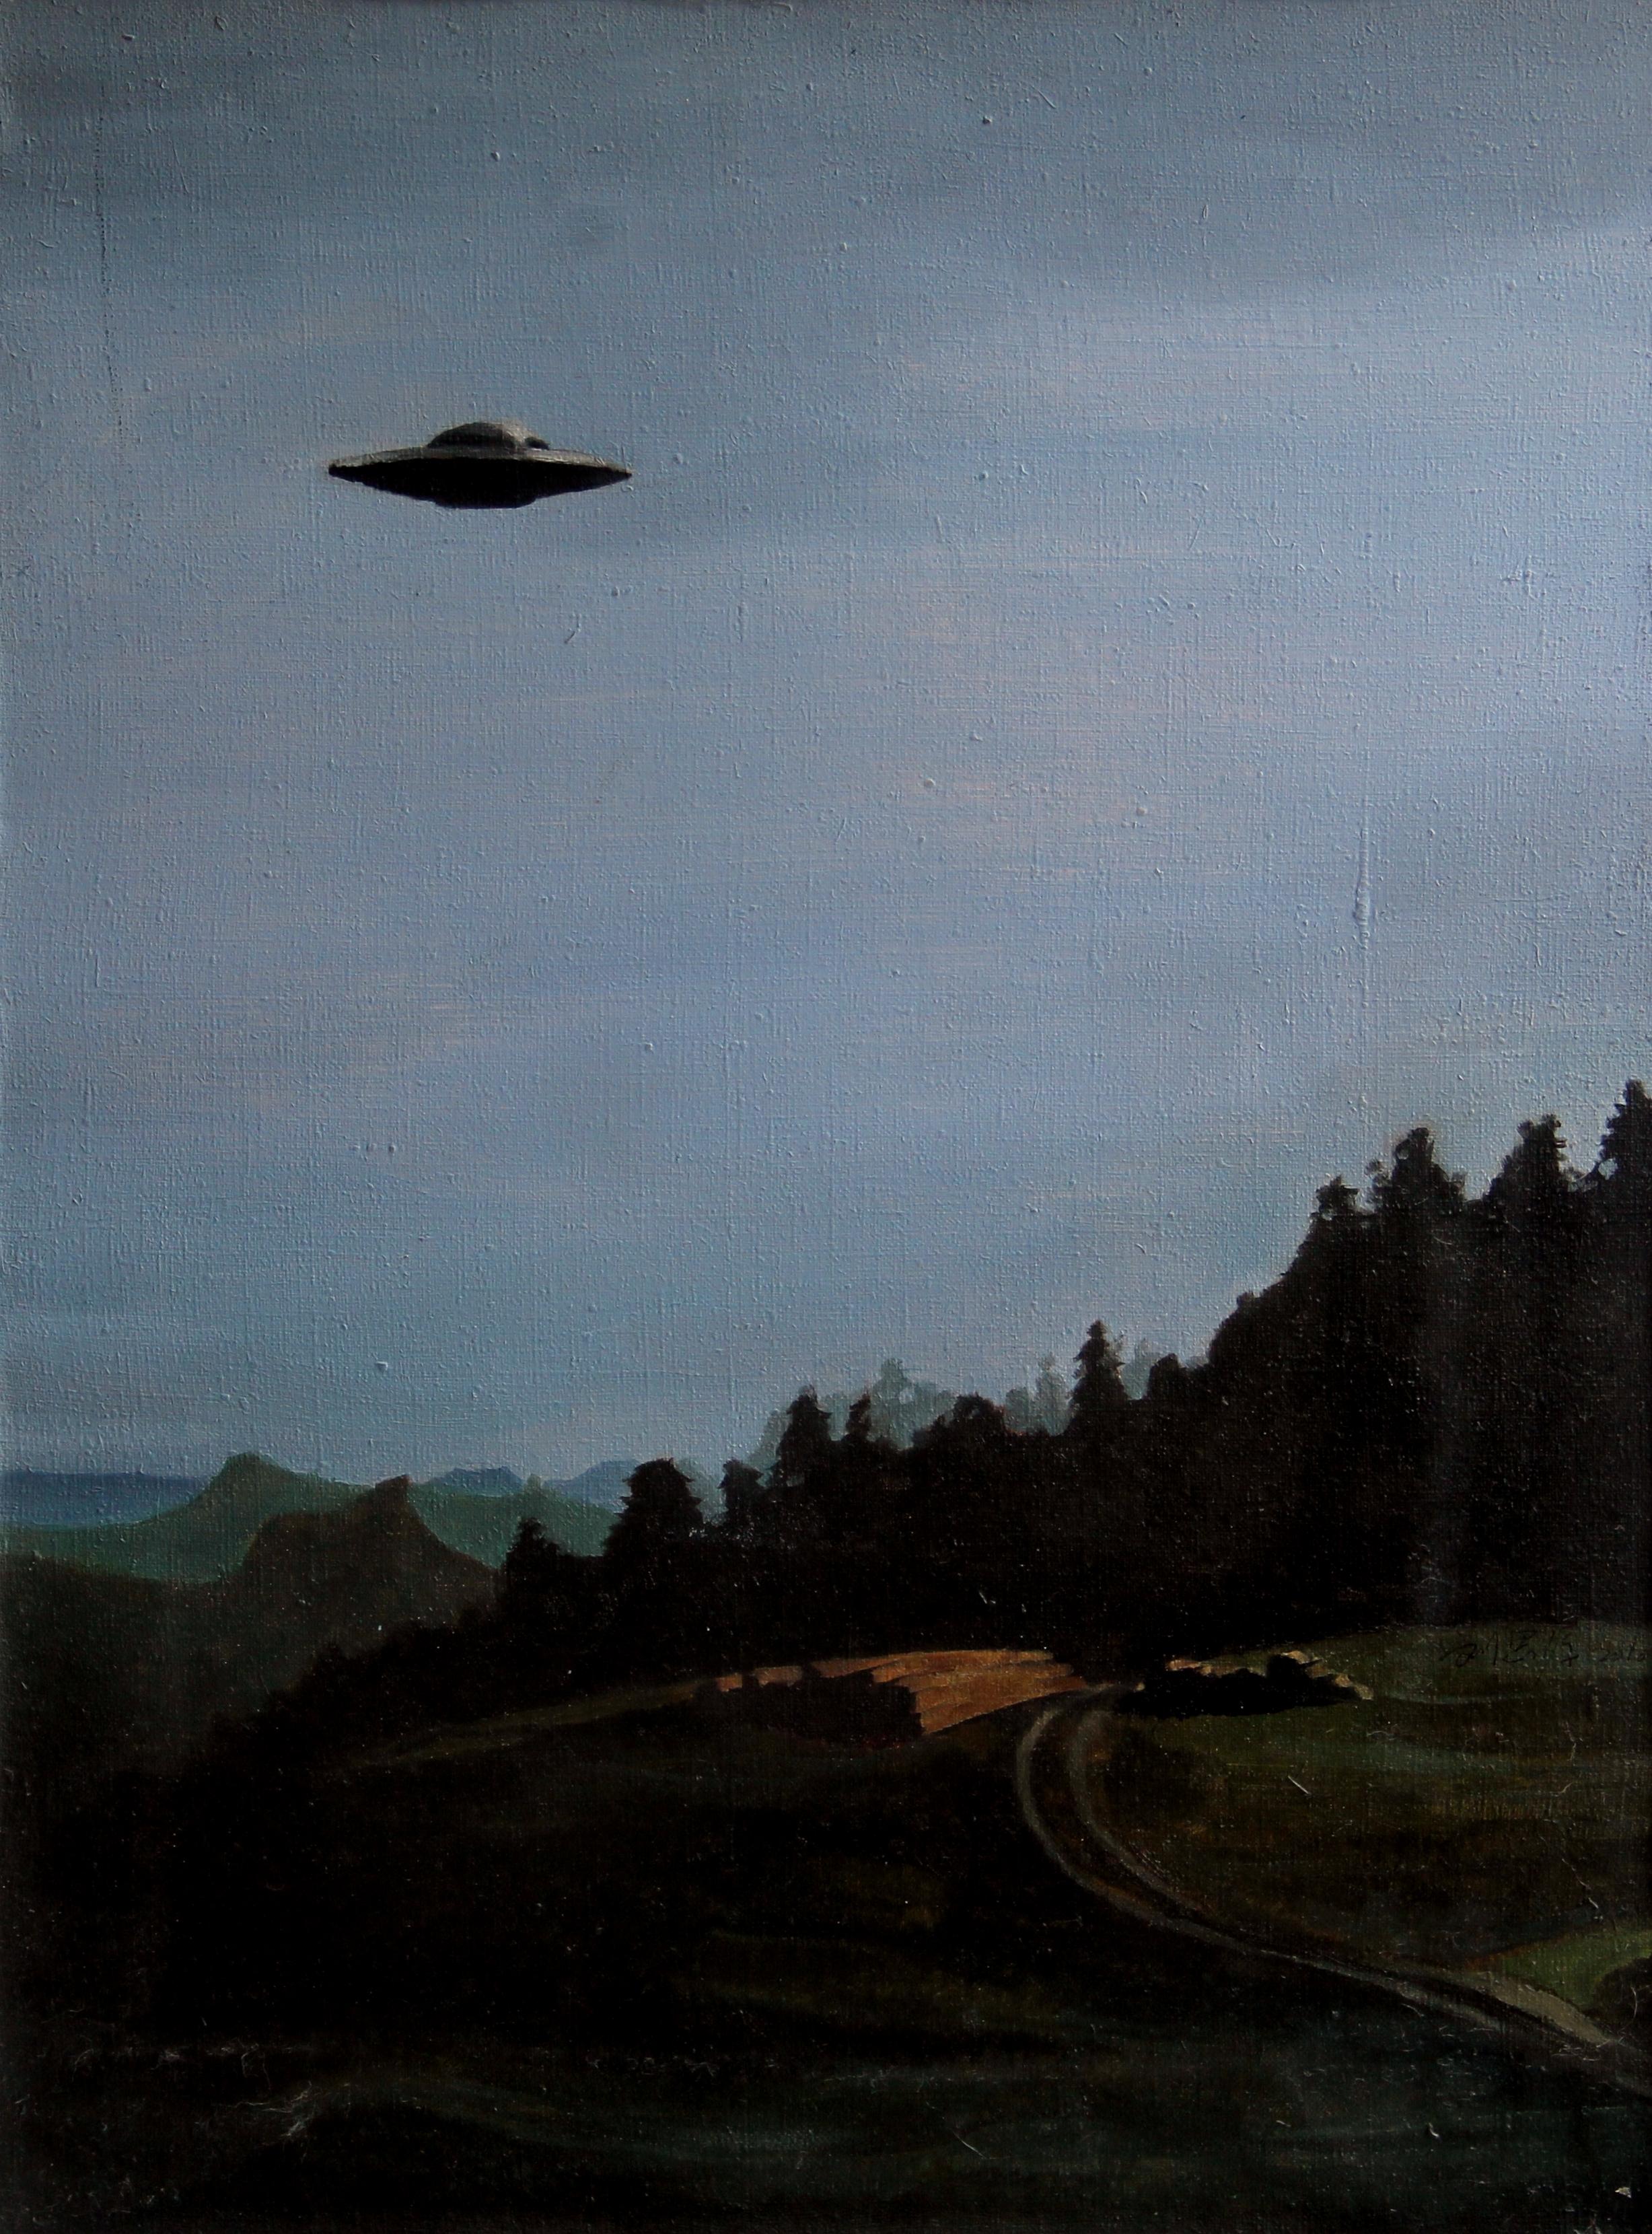 Unidentified Flying Object,2010, 40cm x 30cm, Oil on canvas.jpg